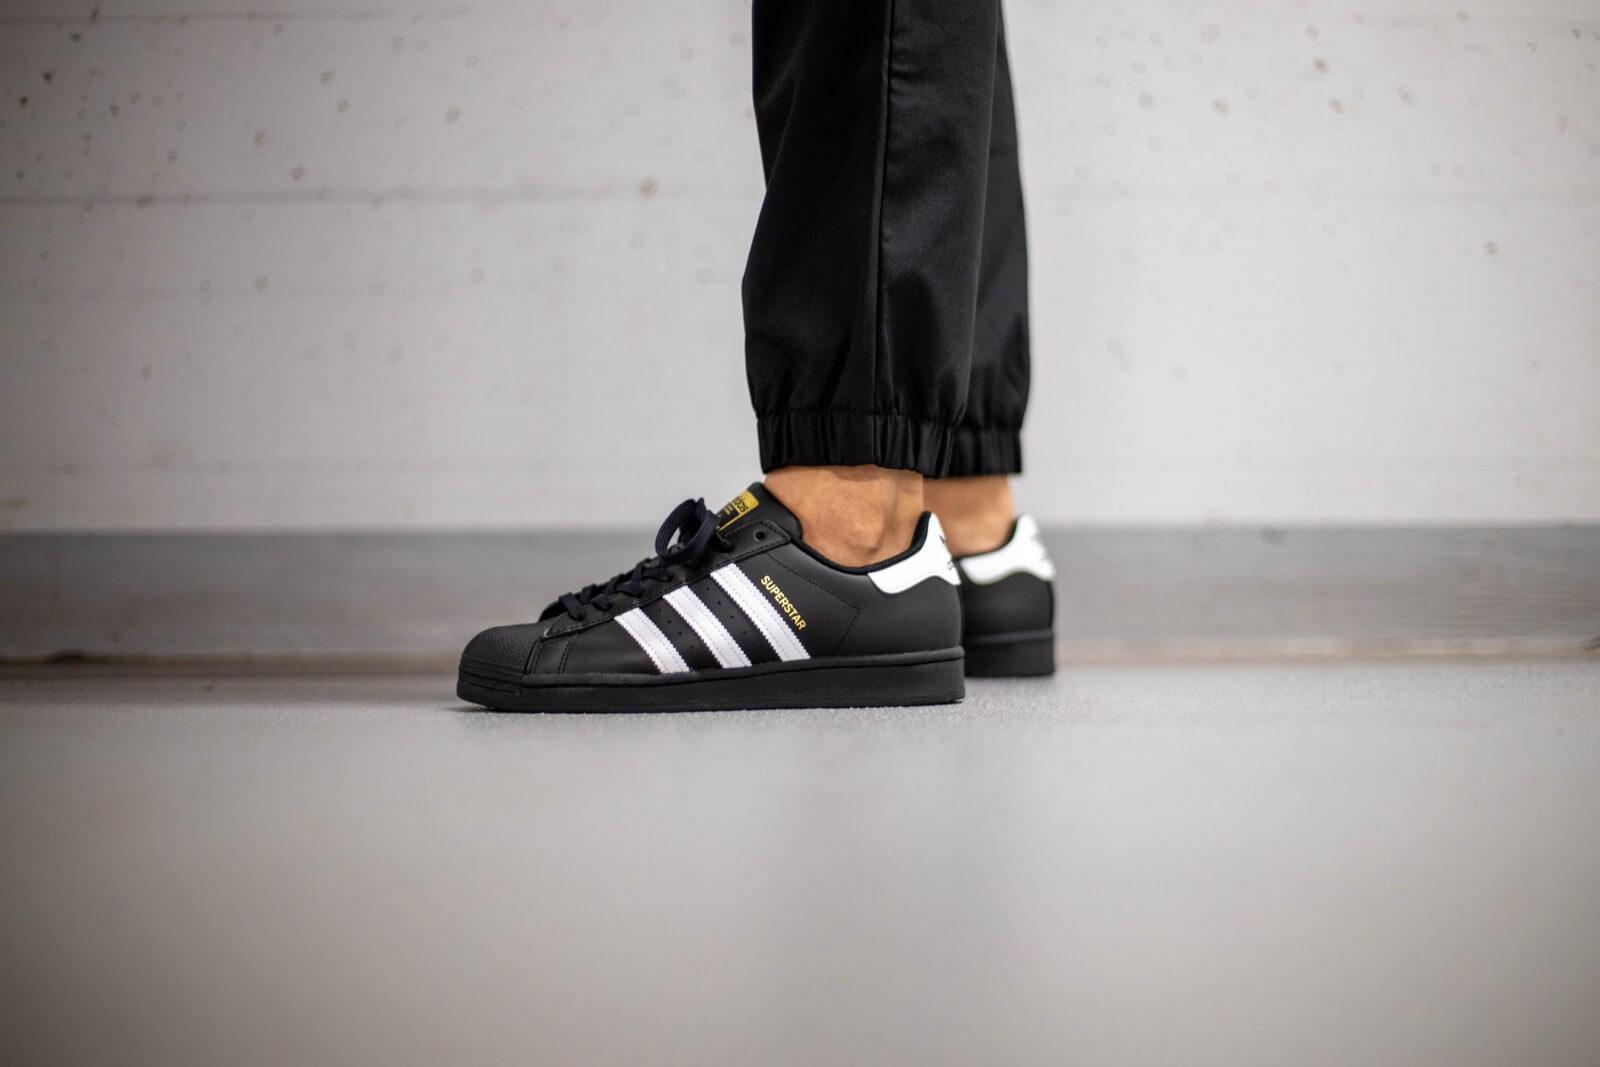 Adidas Superstar Core Black/Footwear White